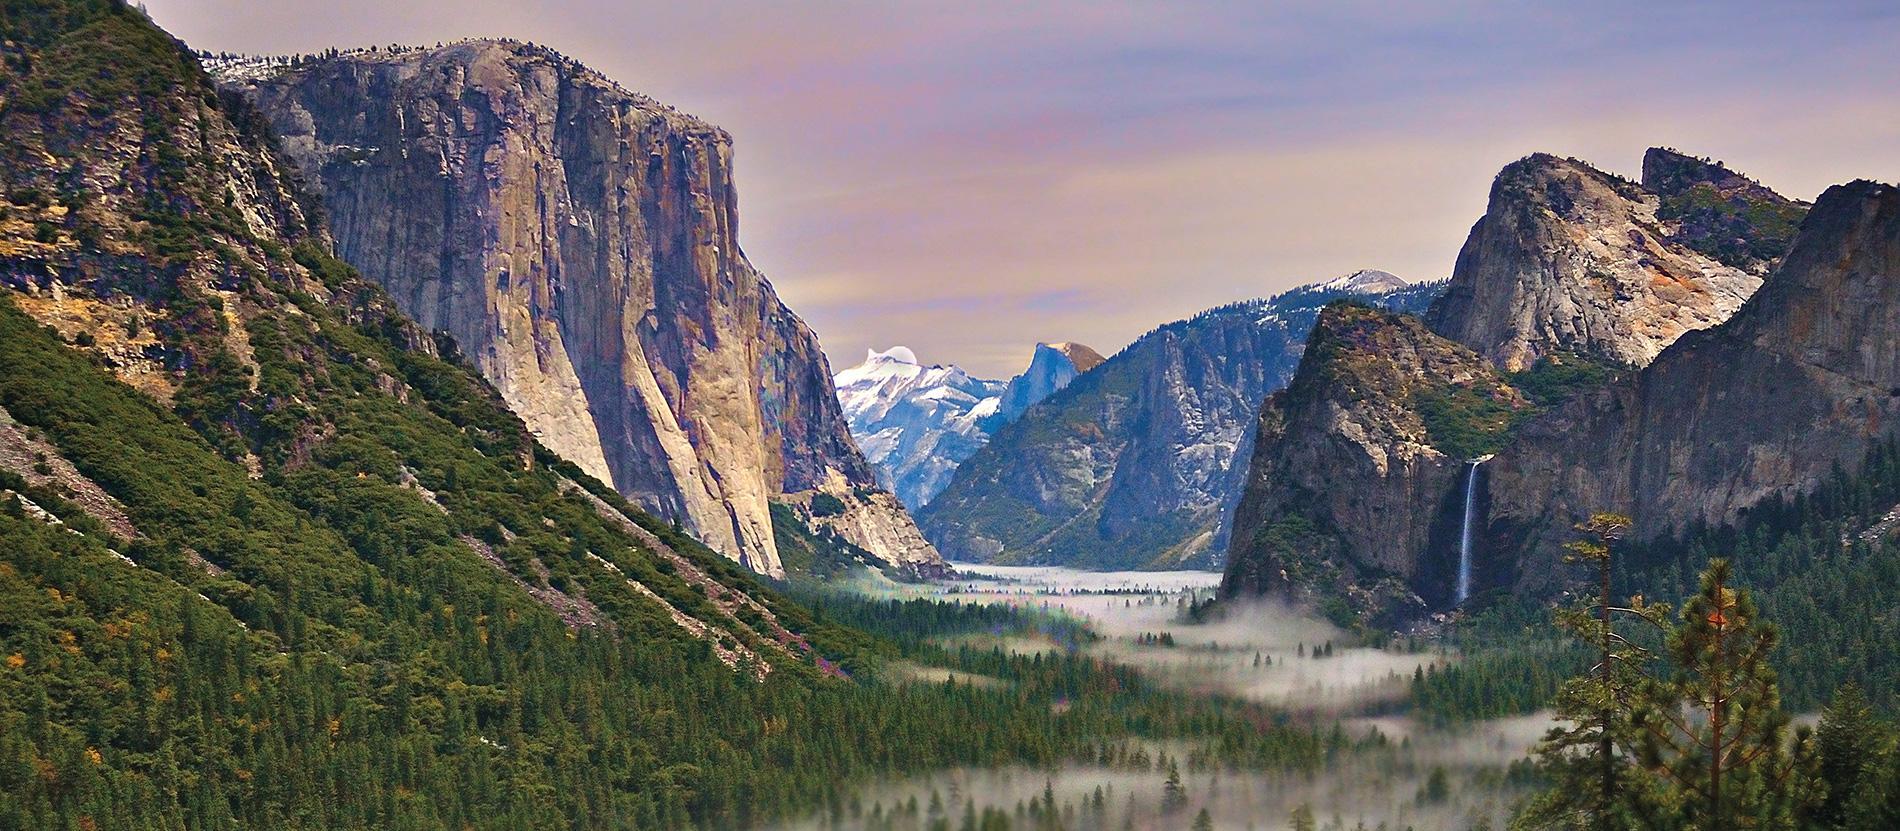 Yosemite Private Tours Yosemite Guided Hiking Tours